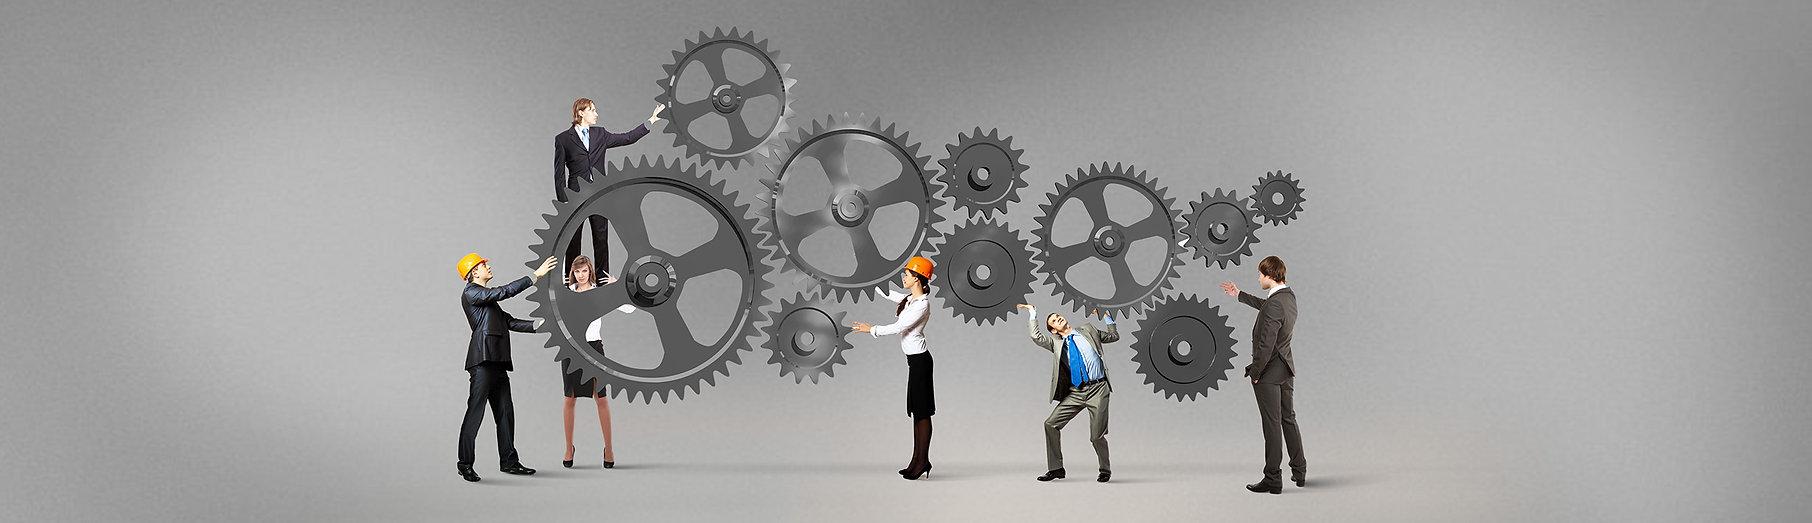 Laponte Business Model Consultants